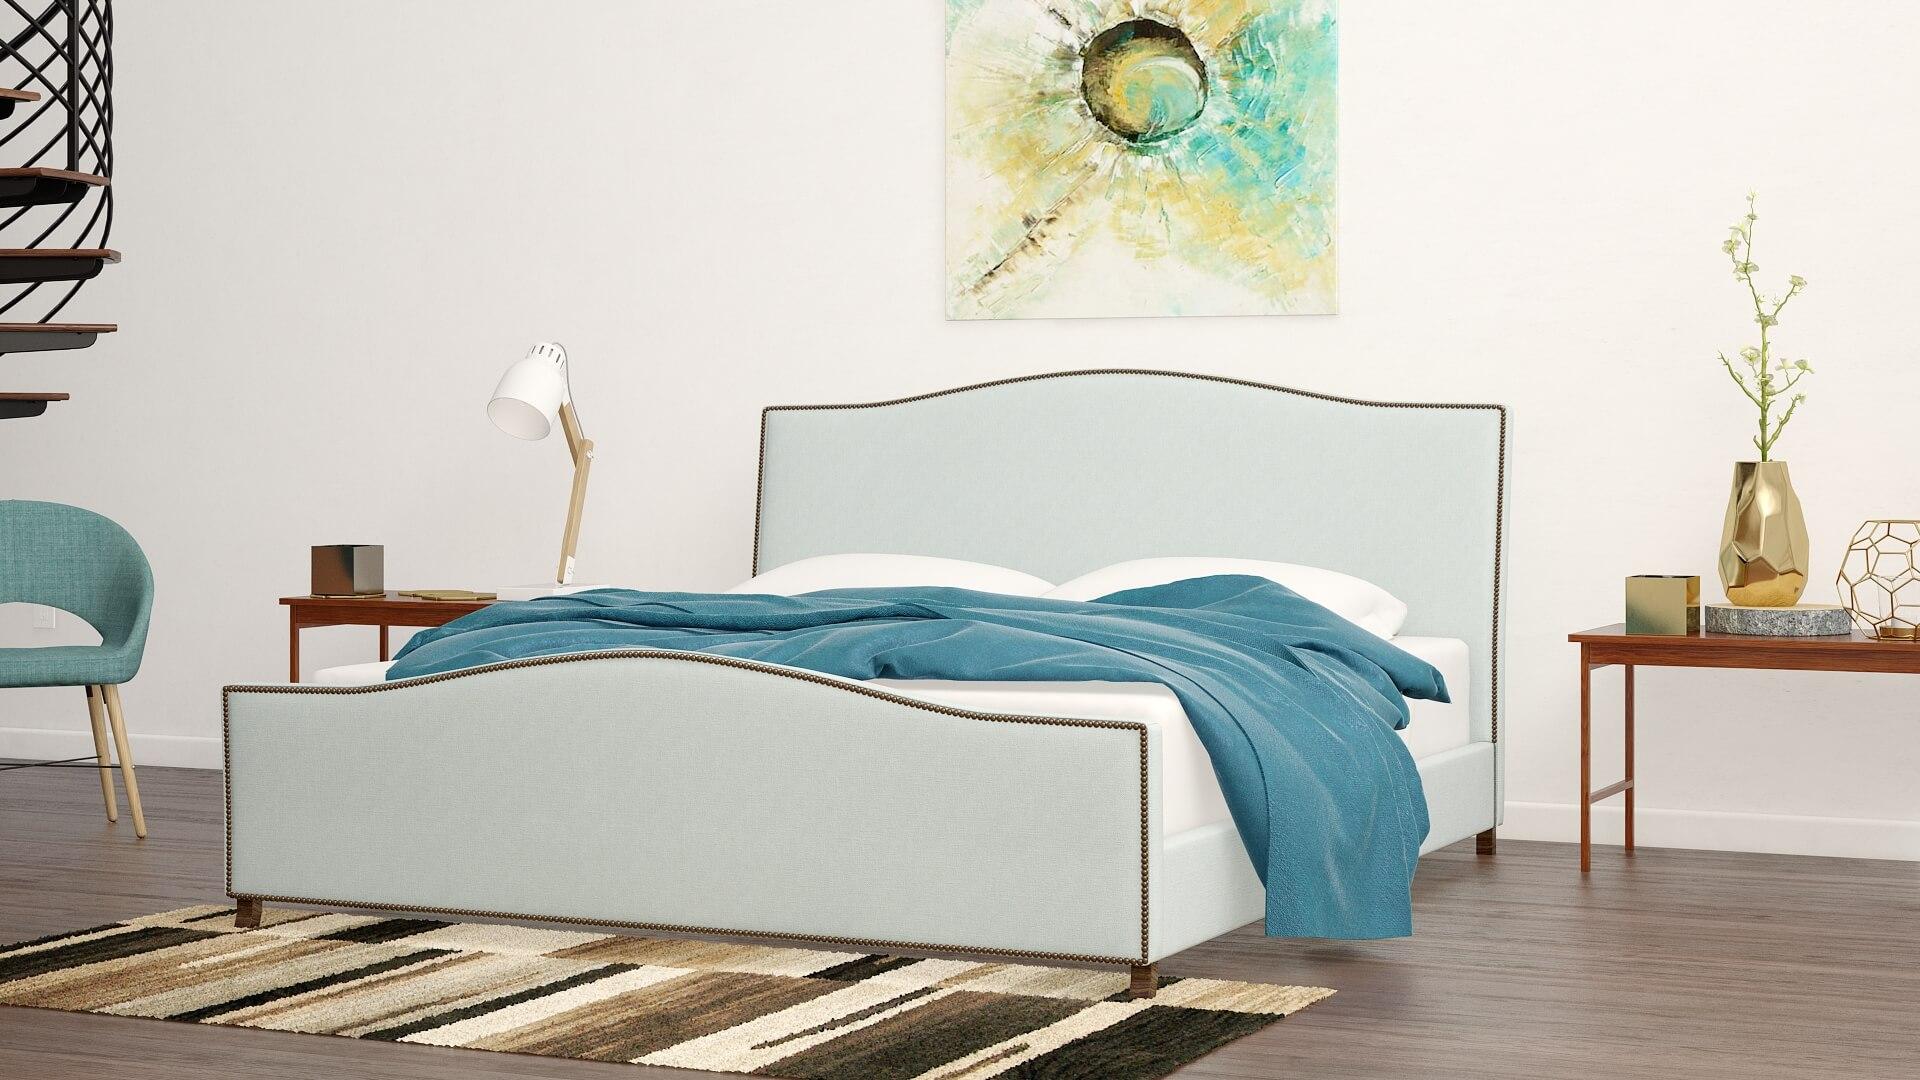 prato bed furniture gallery 5